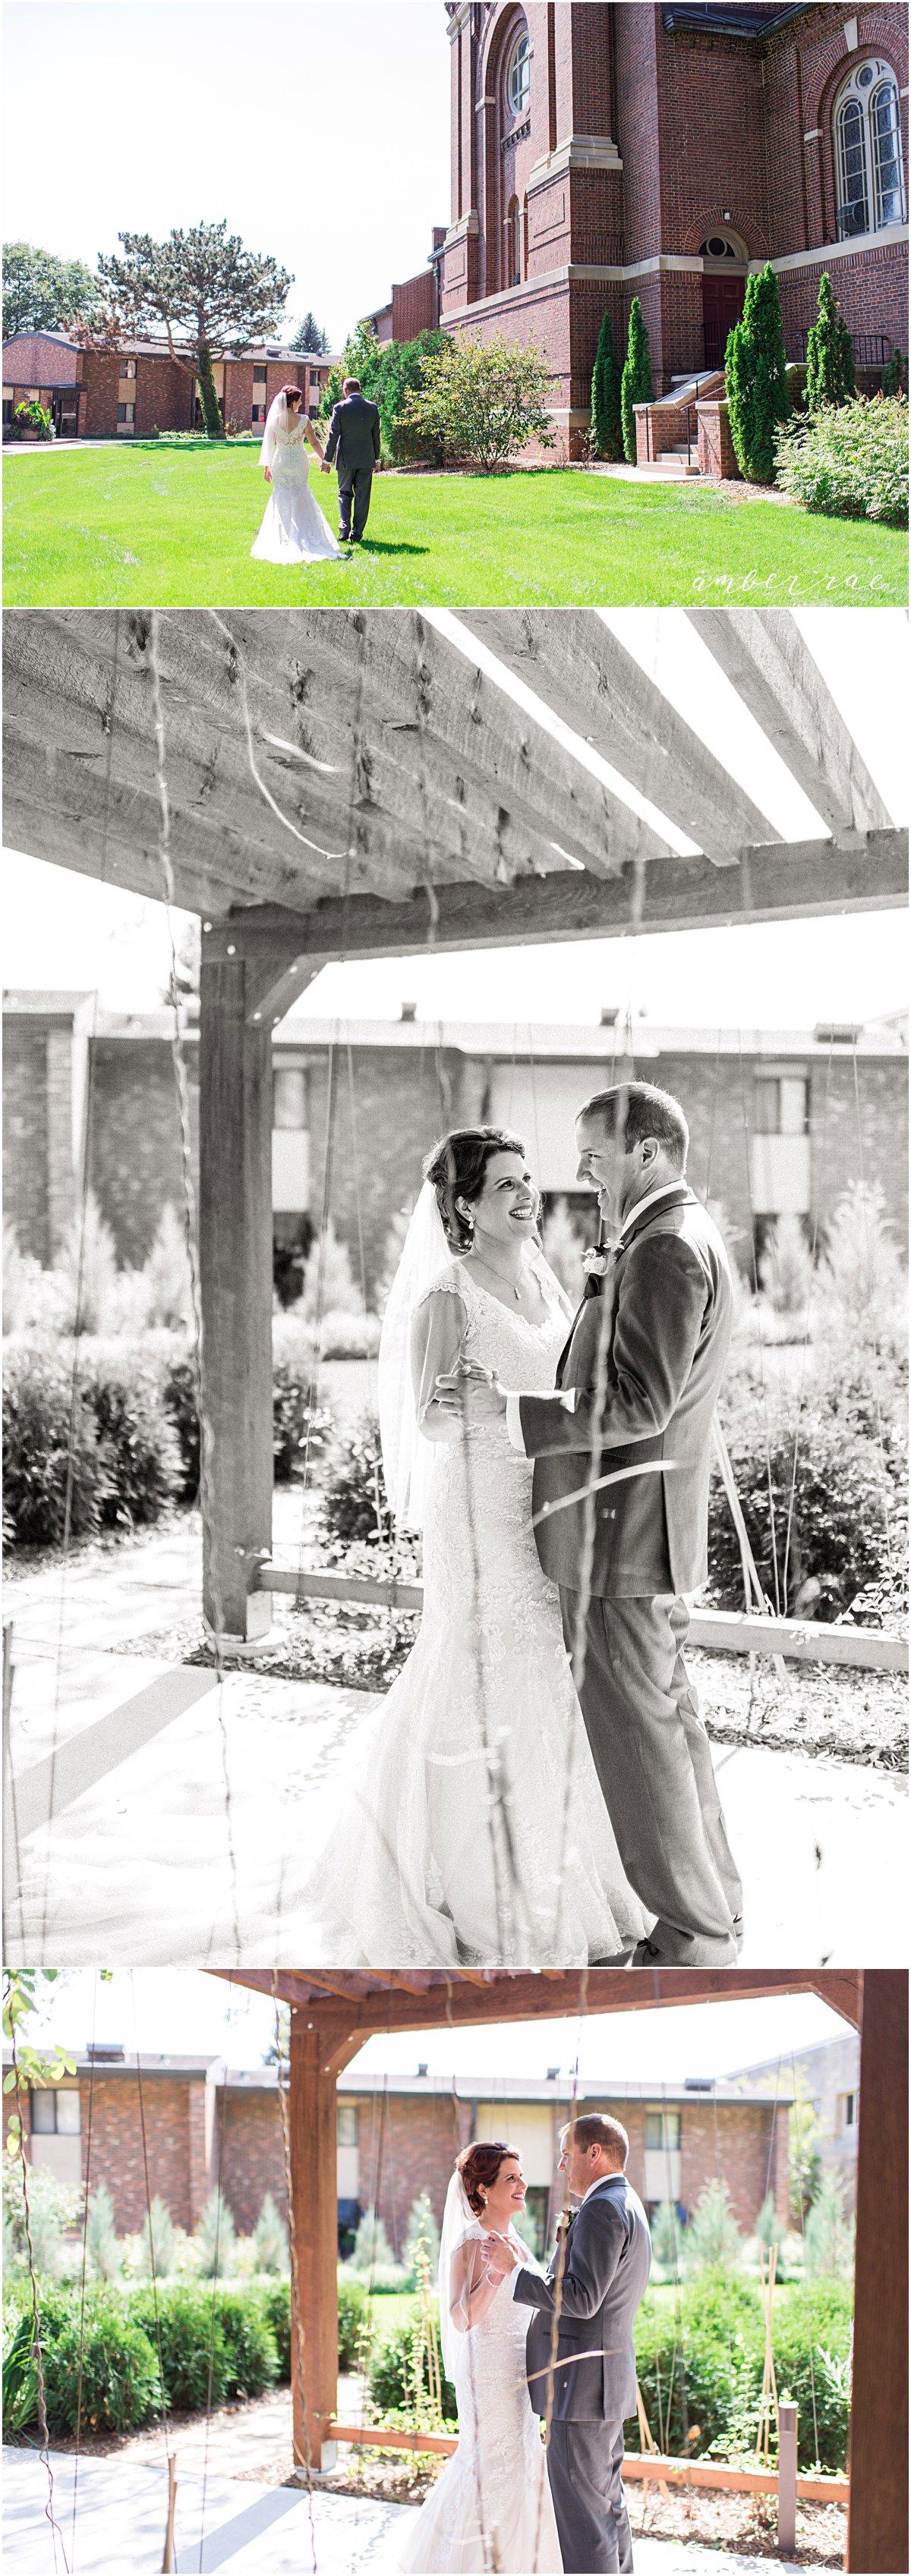 Gustafson Wedding 2018_0009.jpg